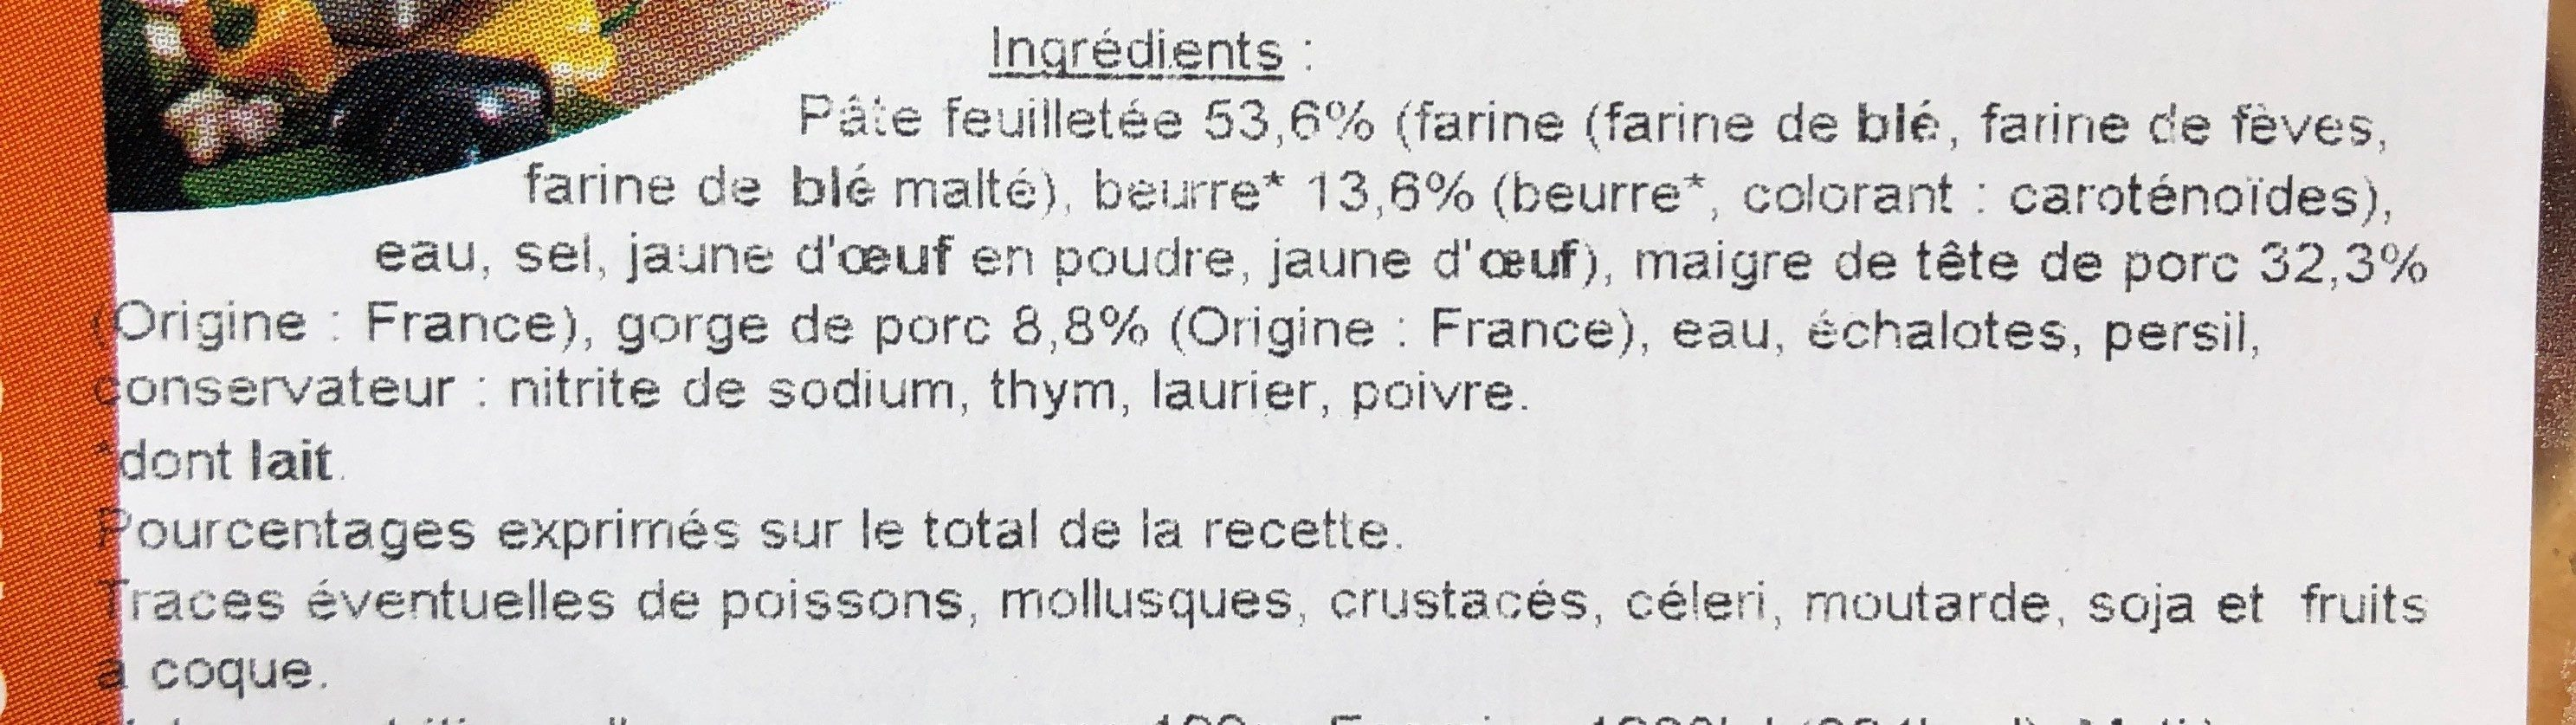 Friand à la viande - Ingredients - fr